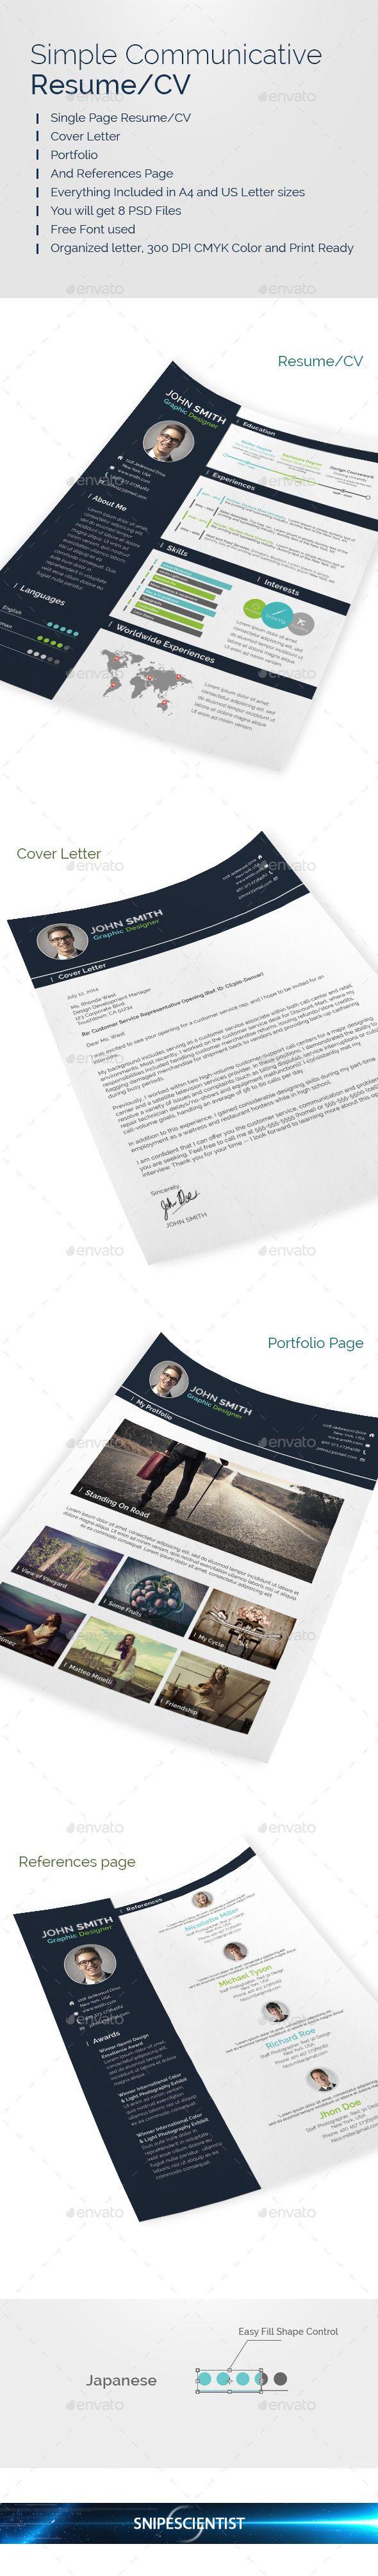 17 best ideas about simple resume resume design cv 17 best ideas about simple resume resume design cv design and graphic designer resume